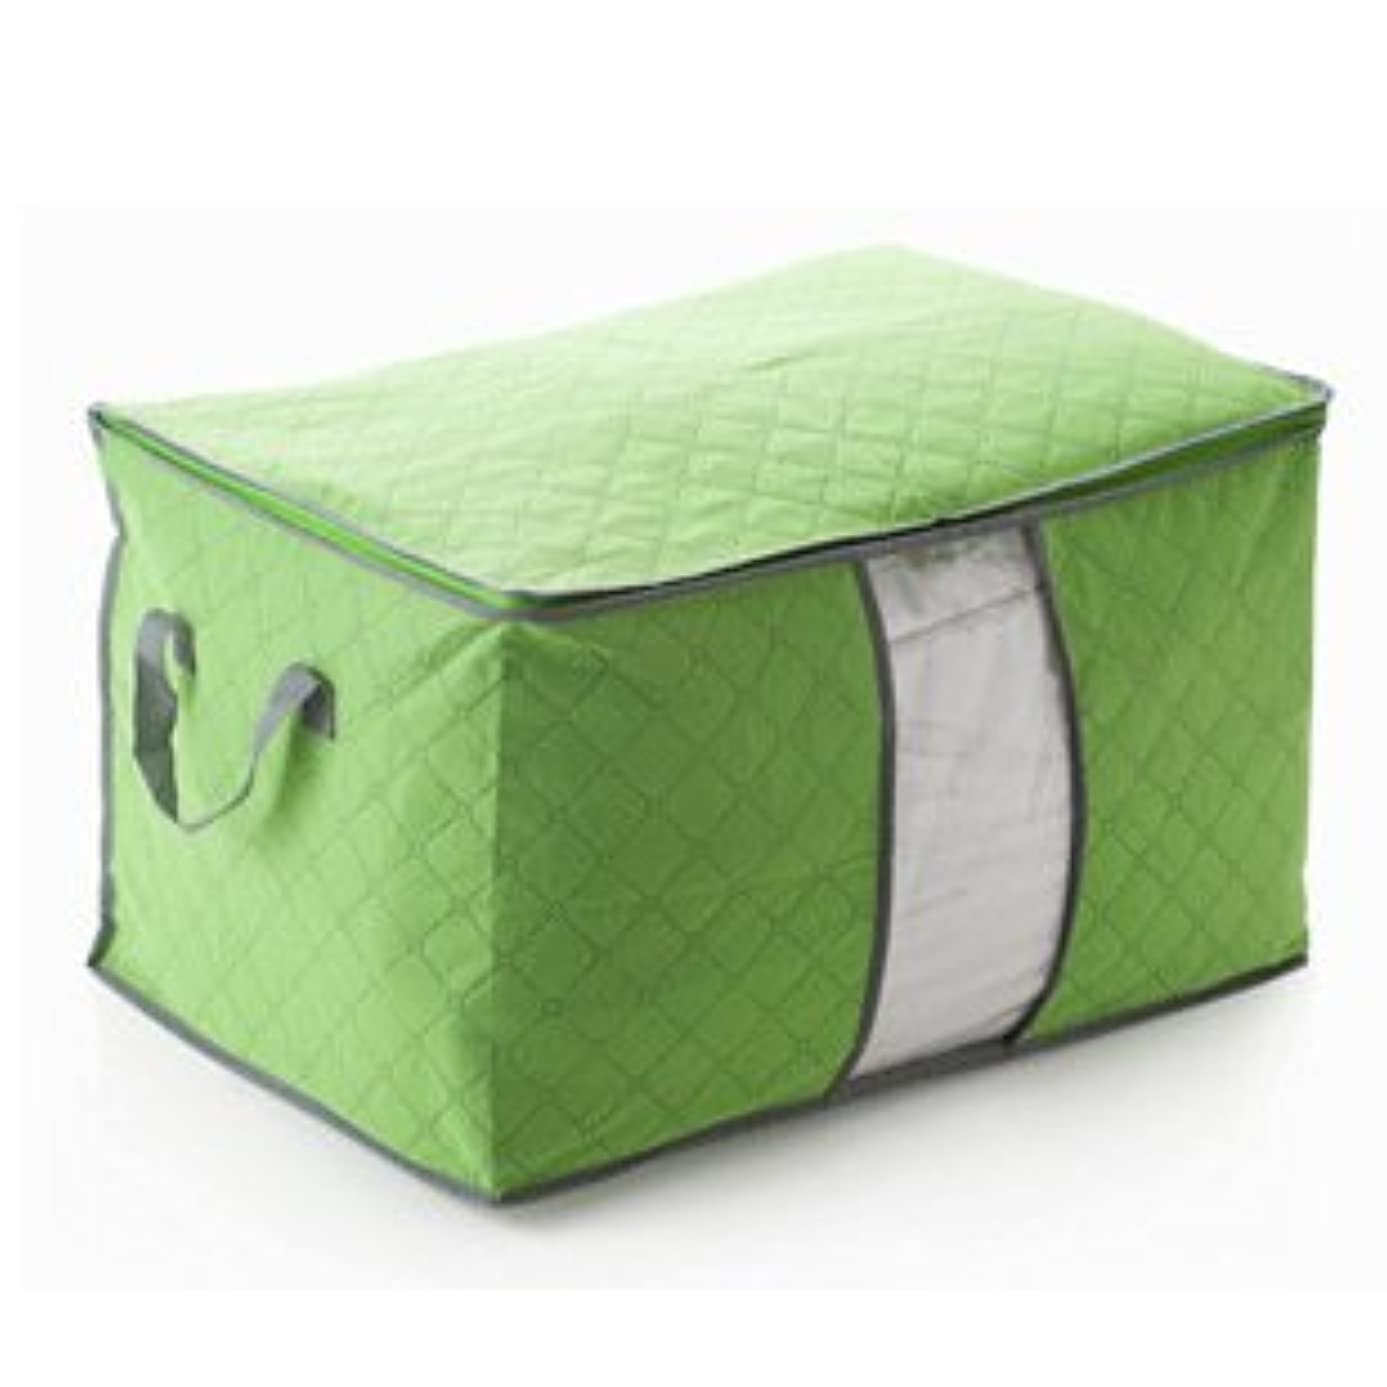 Domire Quilt Cloth Blanket Fabric Storage Organizer Bag Transparent Window Bamboo Charcoal Box (Green)